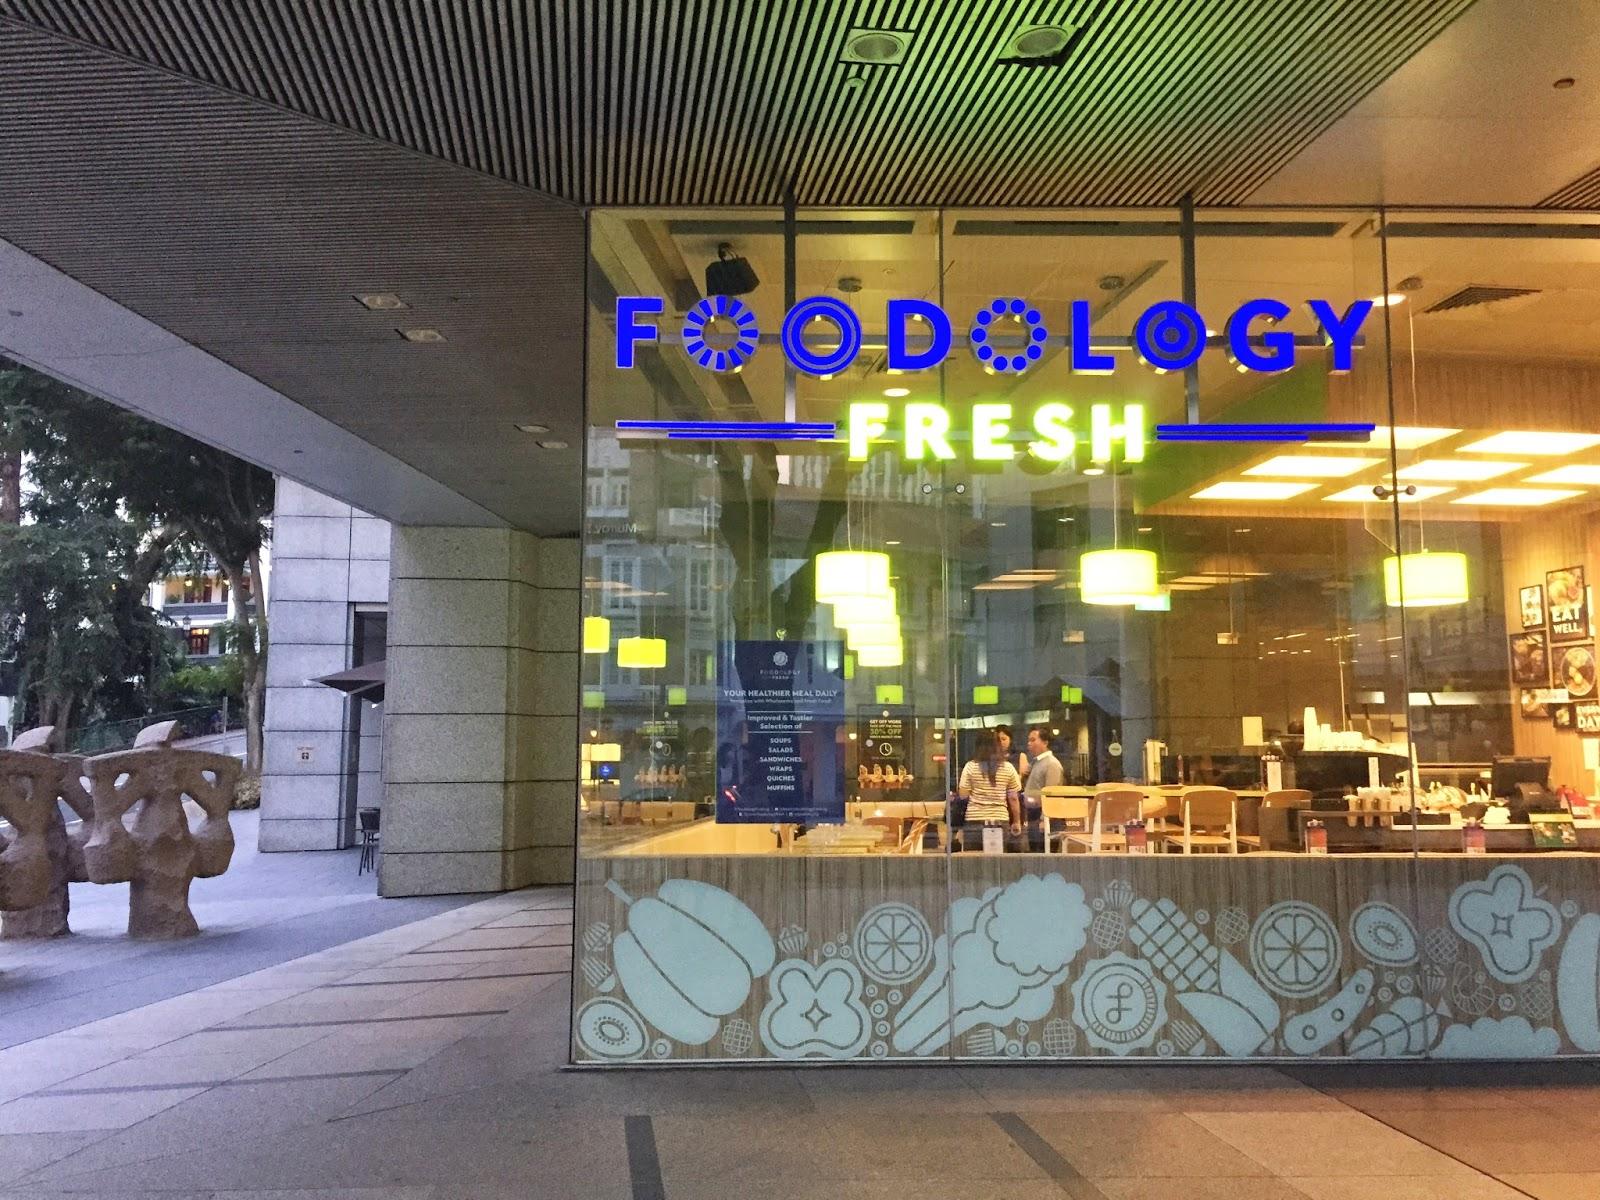 » Foodology Identity & Branding by Somewhere Else